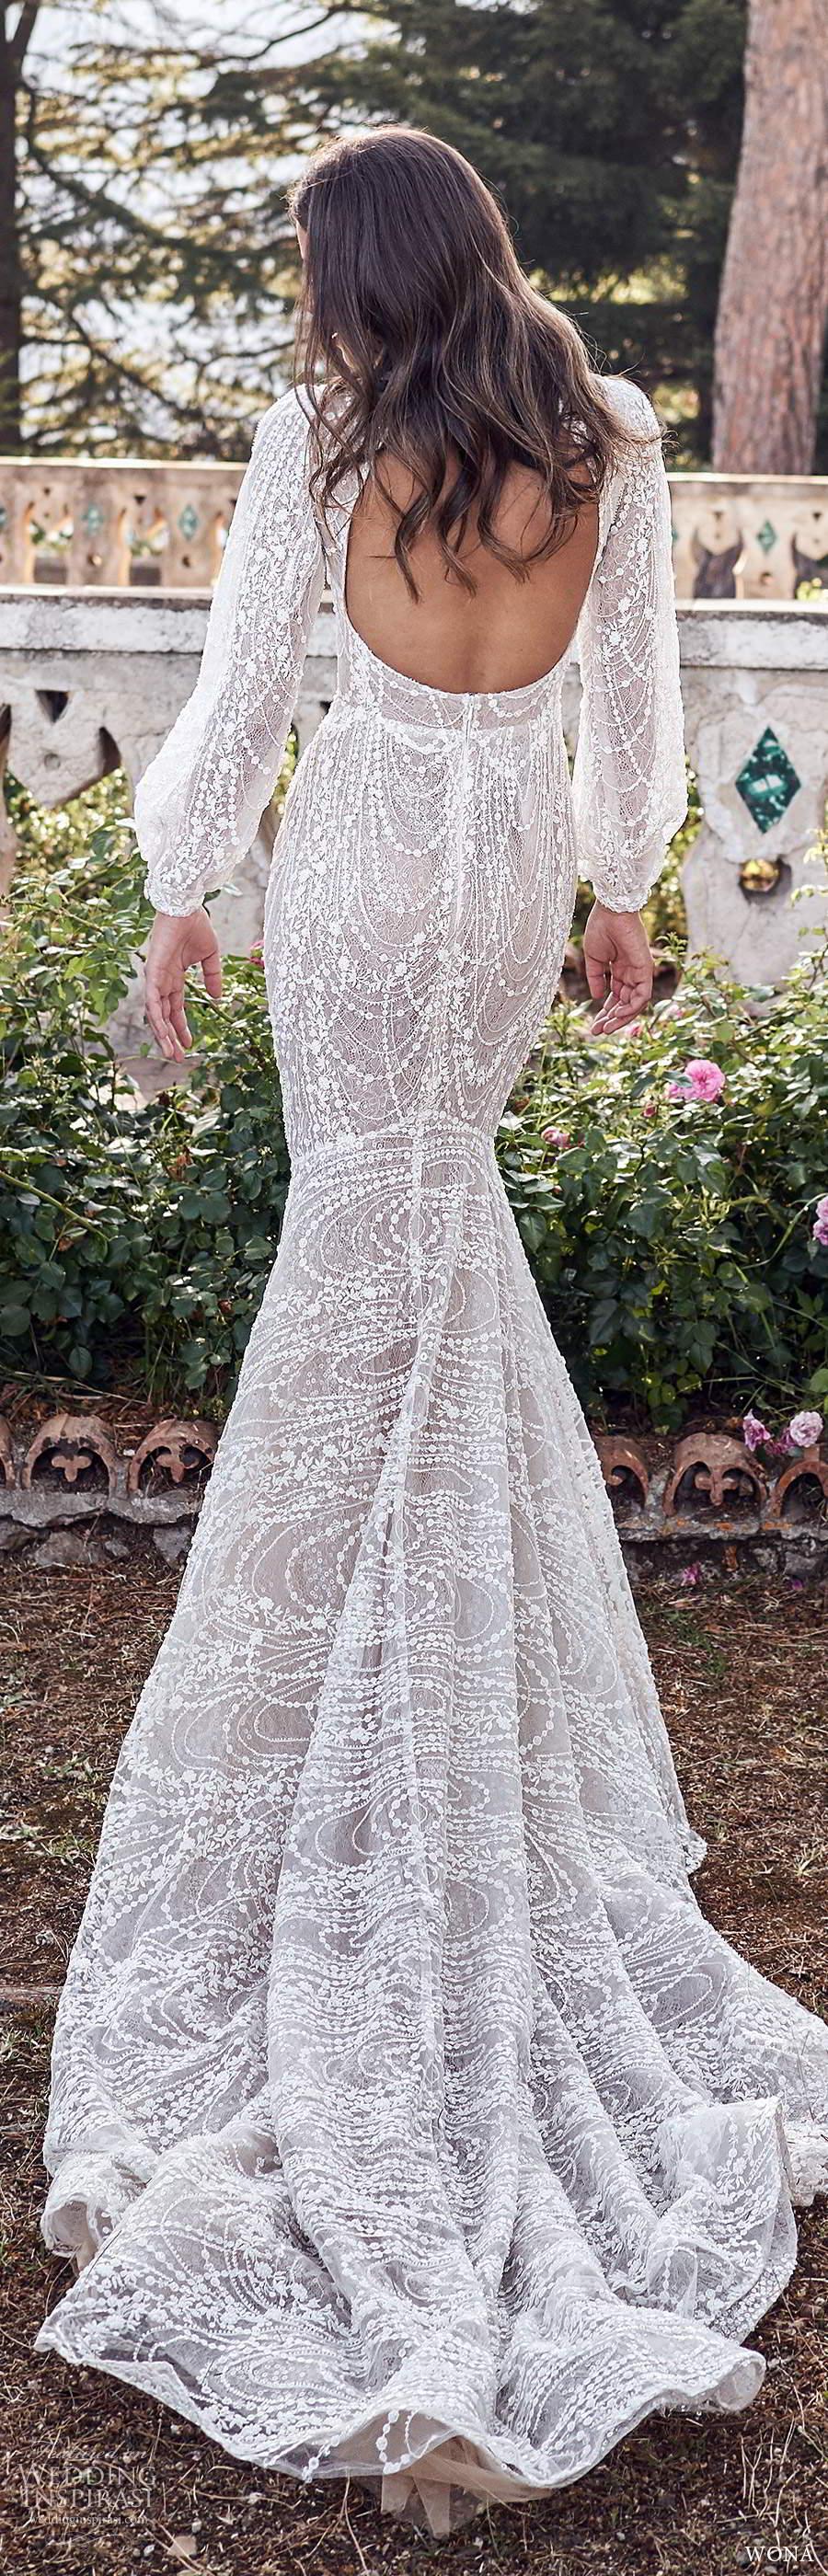 wona fall 2020 bridal long poet sleeves v neckline fully embellished fit flare mermaid wedding dress scoop back chapel train (3) bv